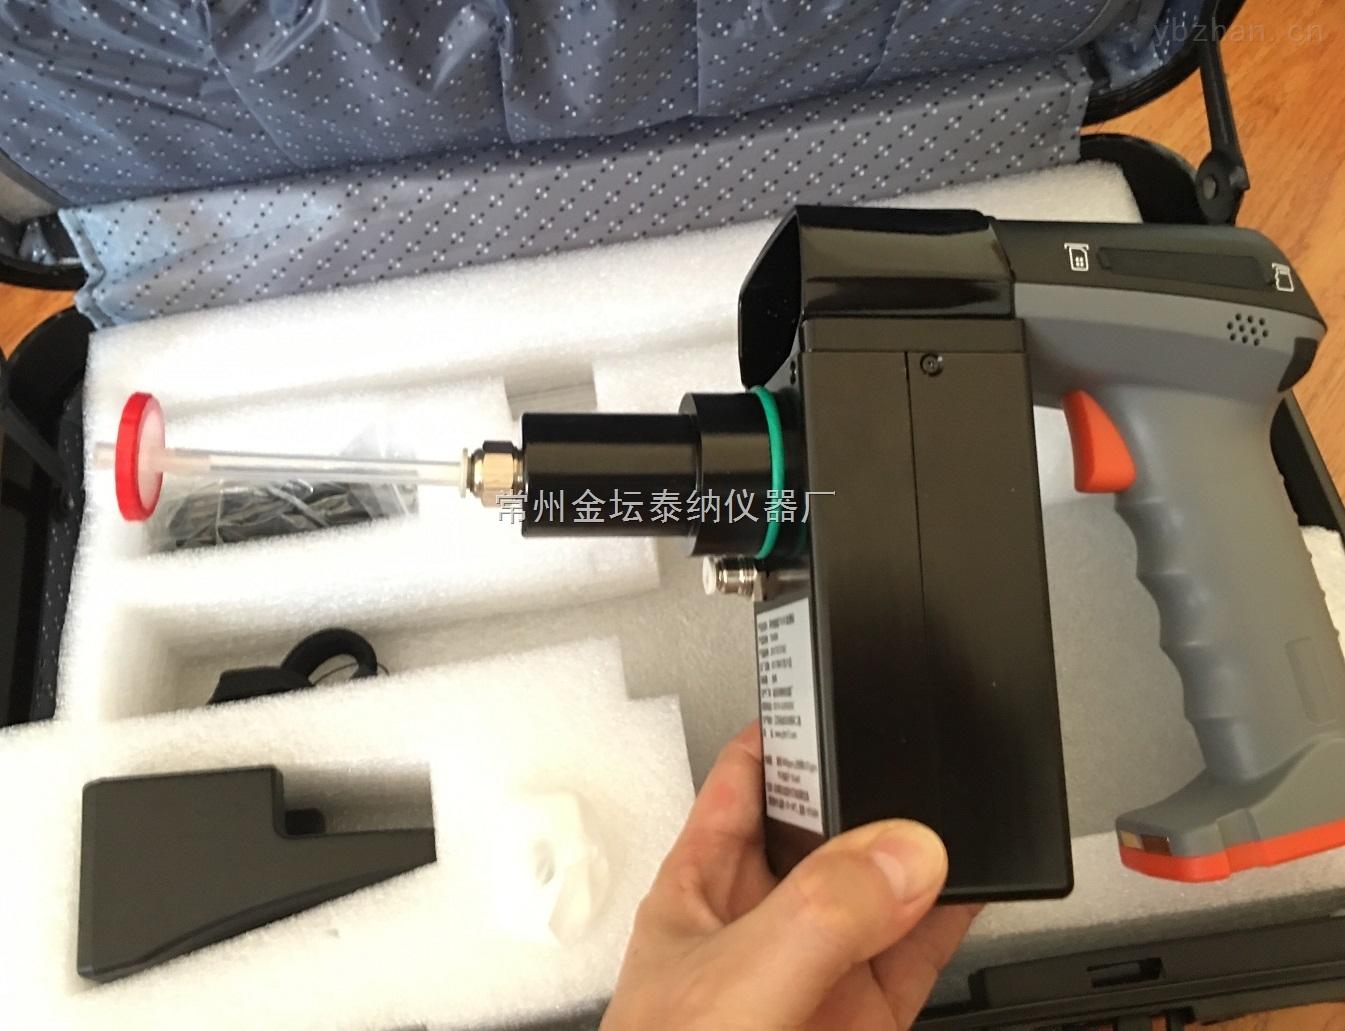 TN800系列-金坛泰纳苯系物检测仪